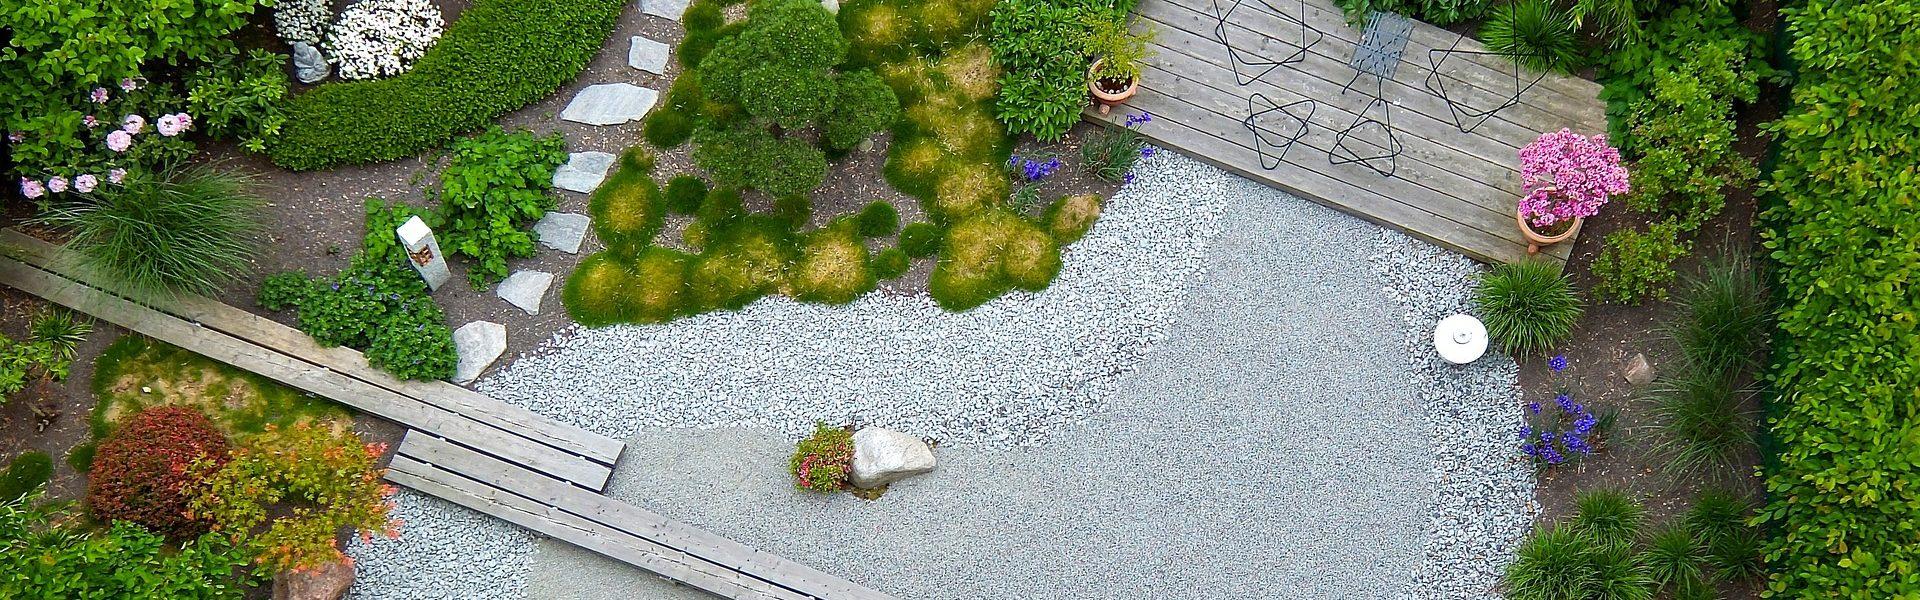 garden-landscaping-1684852_1920